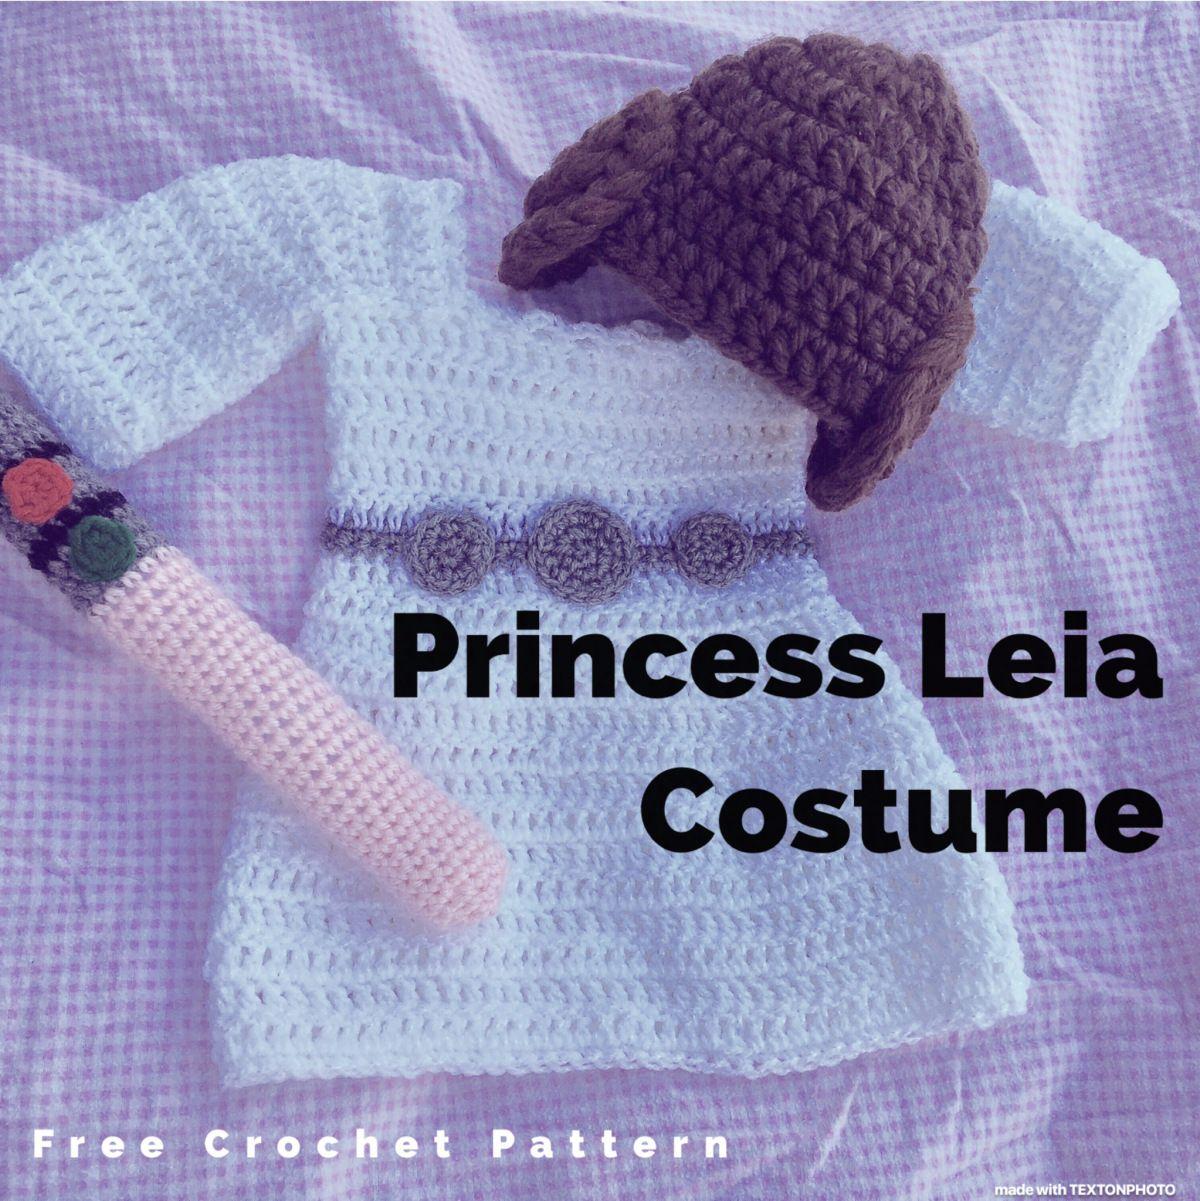 Princess leia free crochet pattern part 1 leia star wars princess leia free crochet pattern part 1 bankloansurffo Images